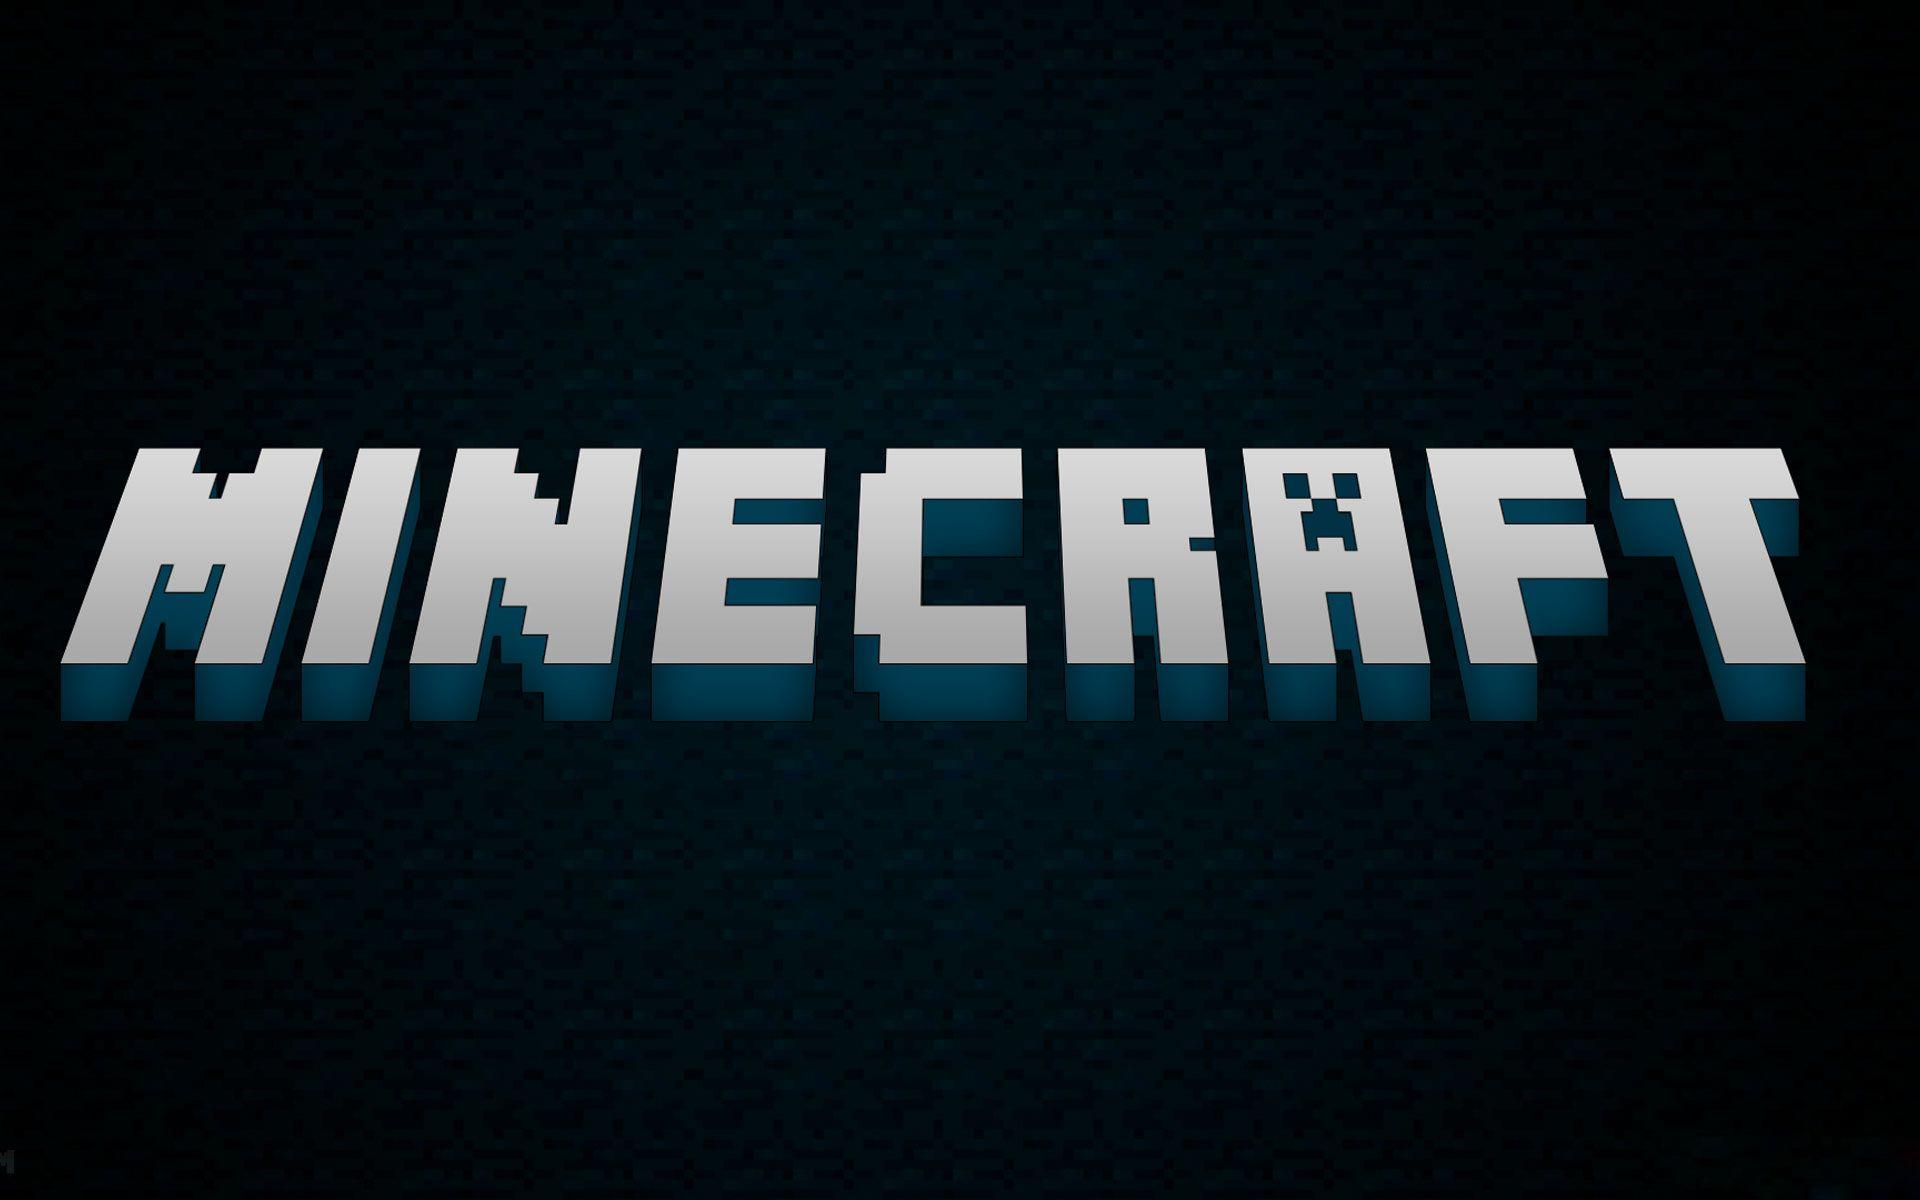 Minecraft Background Maker Wallpaper Free Cool HD